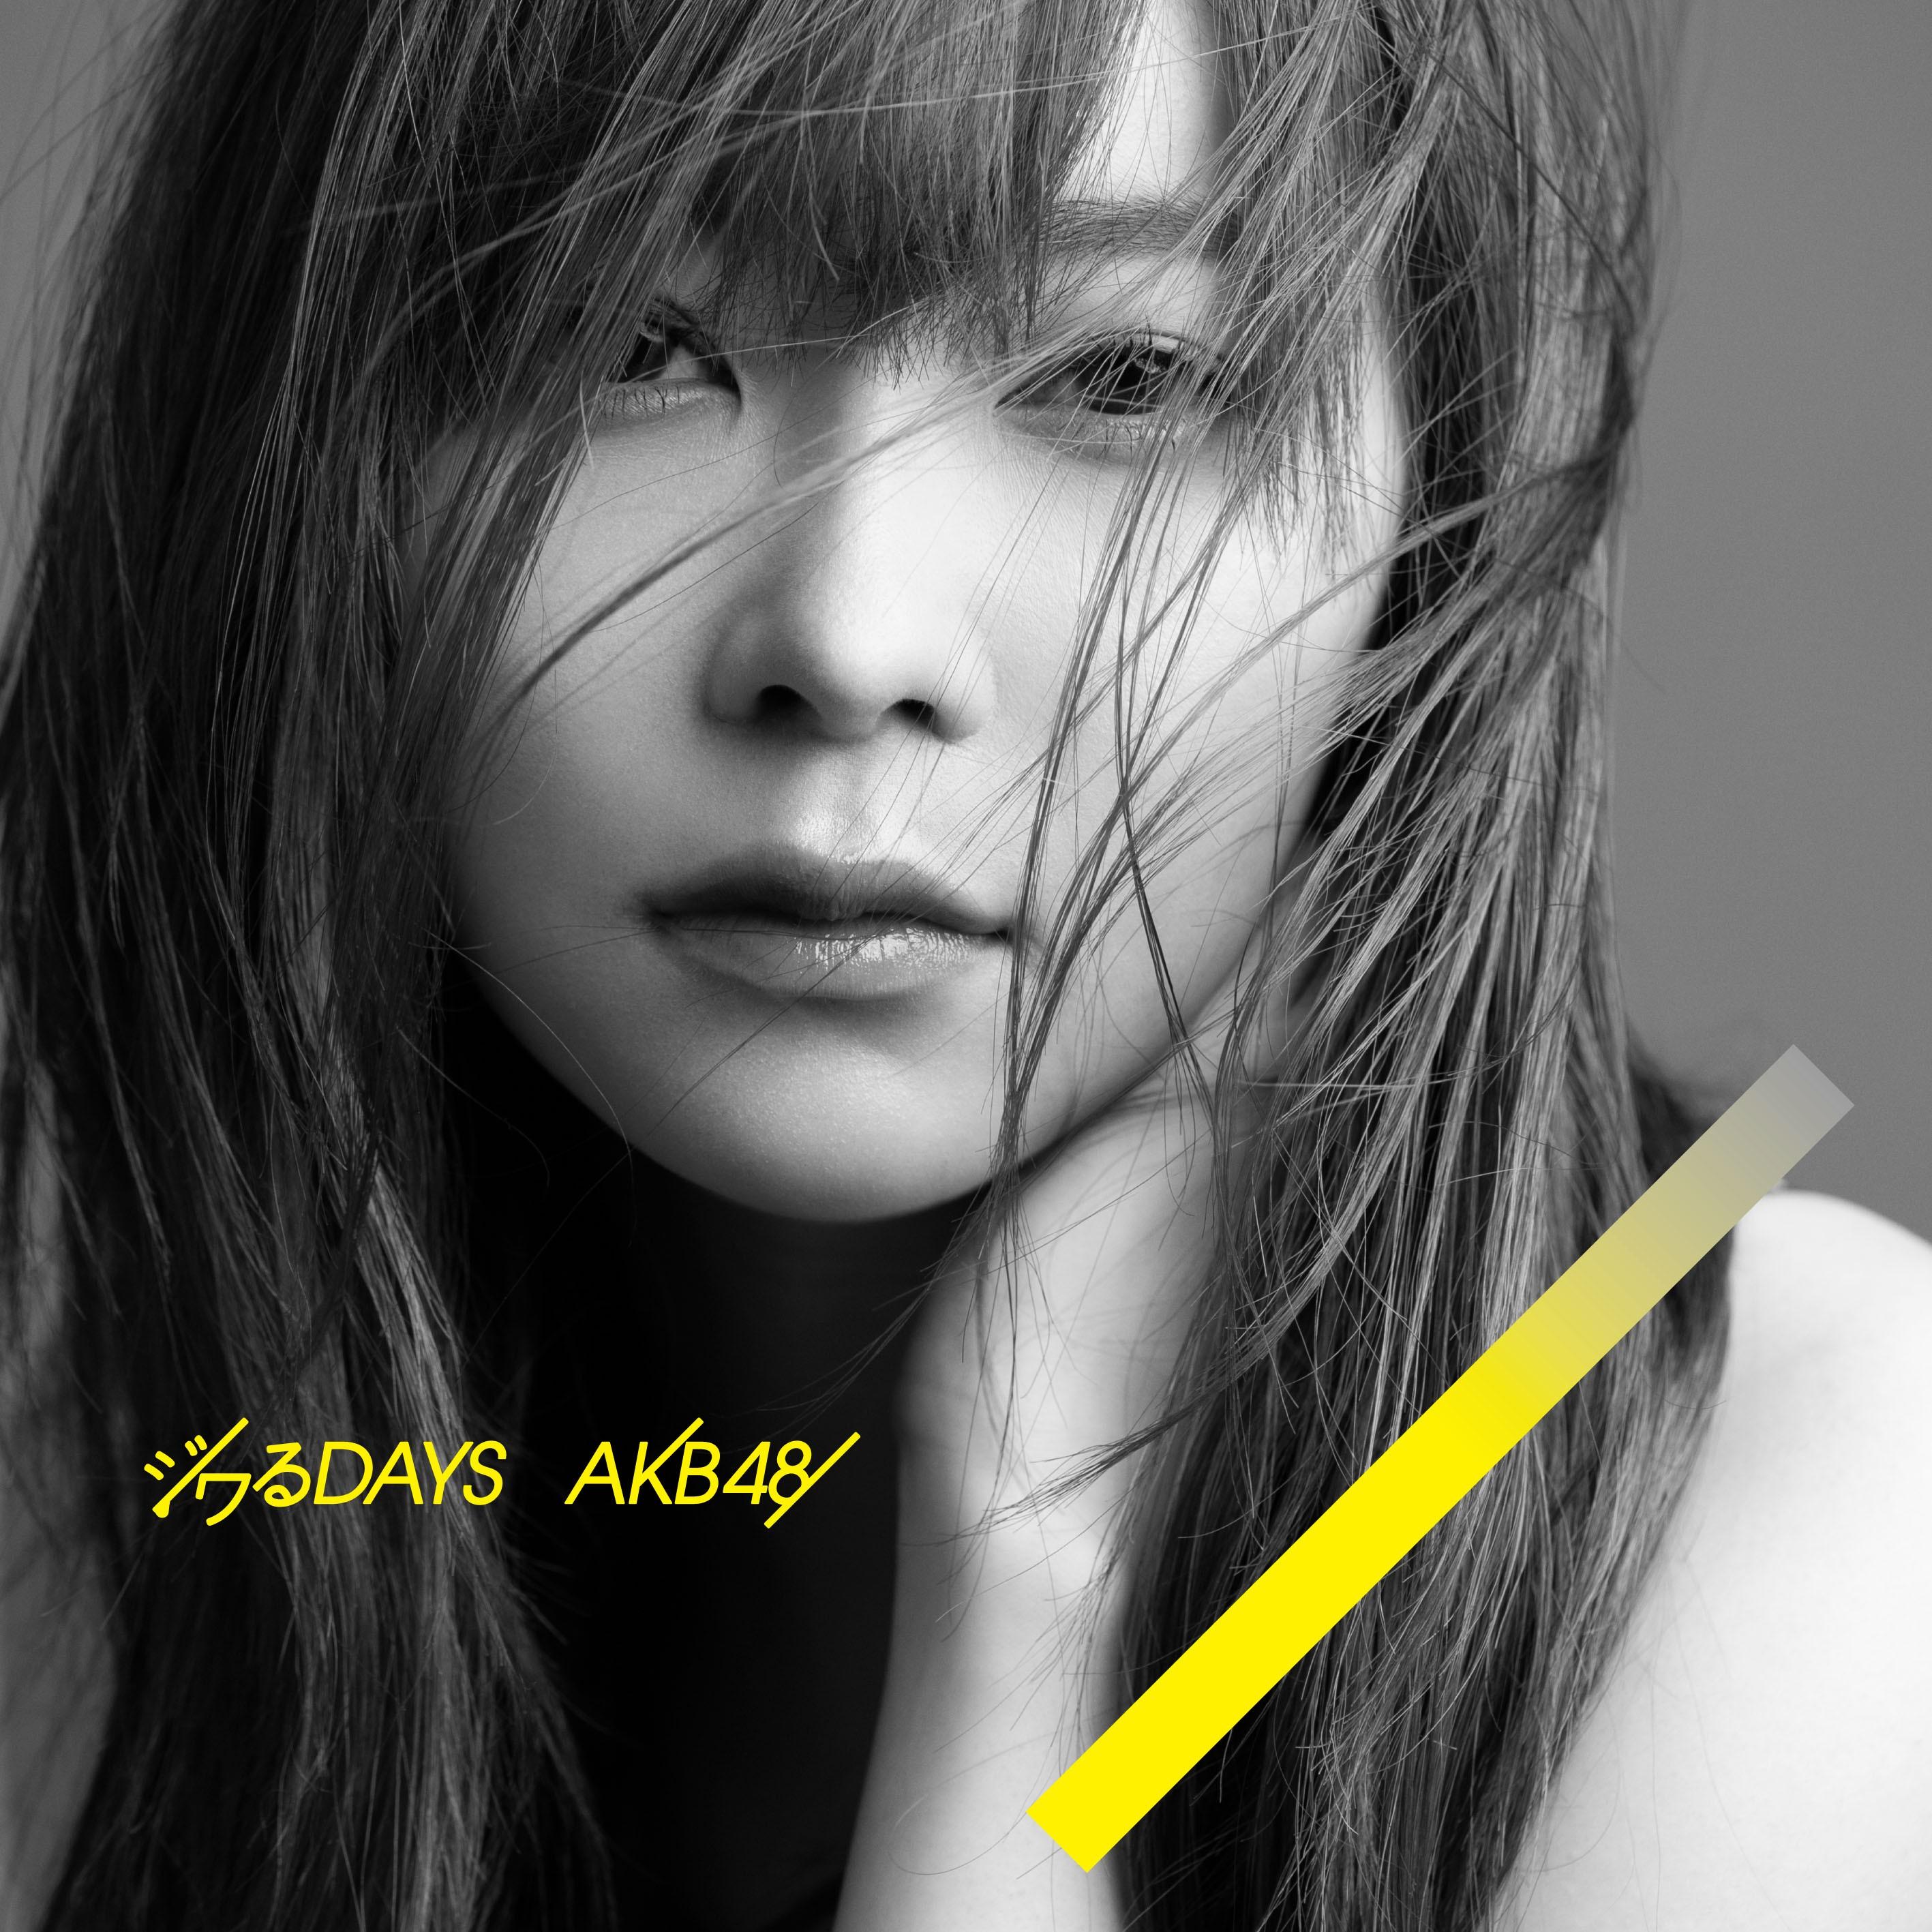 AKB48 – ジワるDAYS [FLAC + MP3 320 + DVD ISO] [2019.03.13]